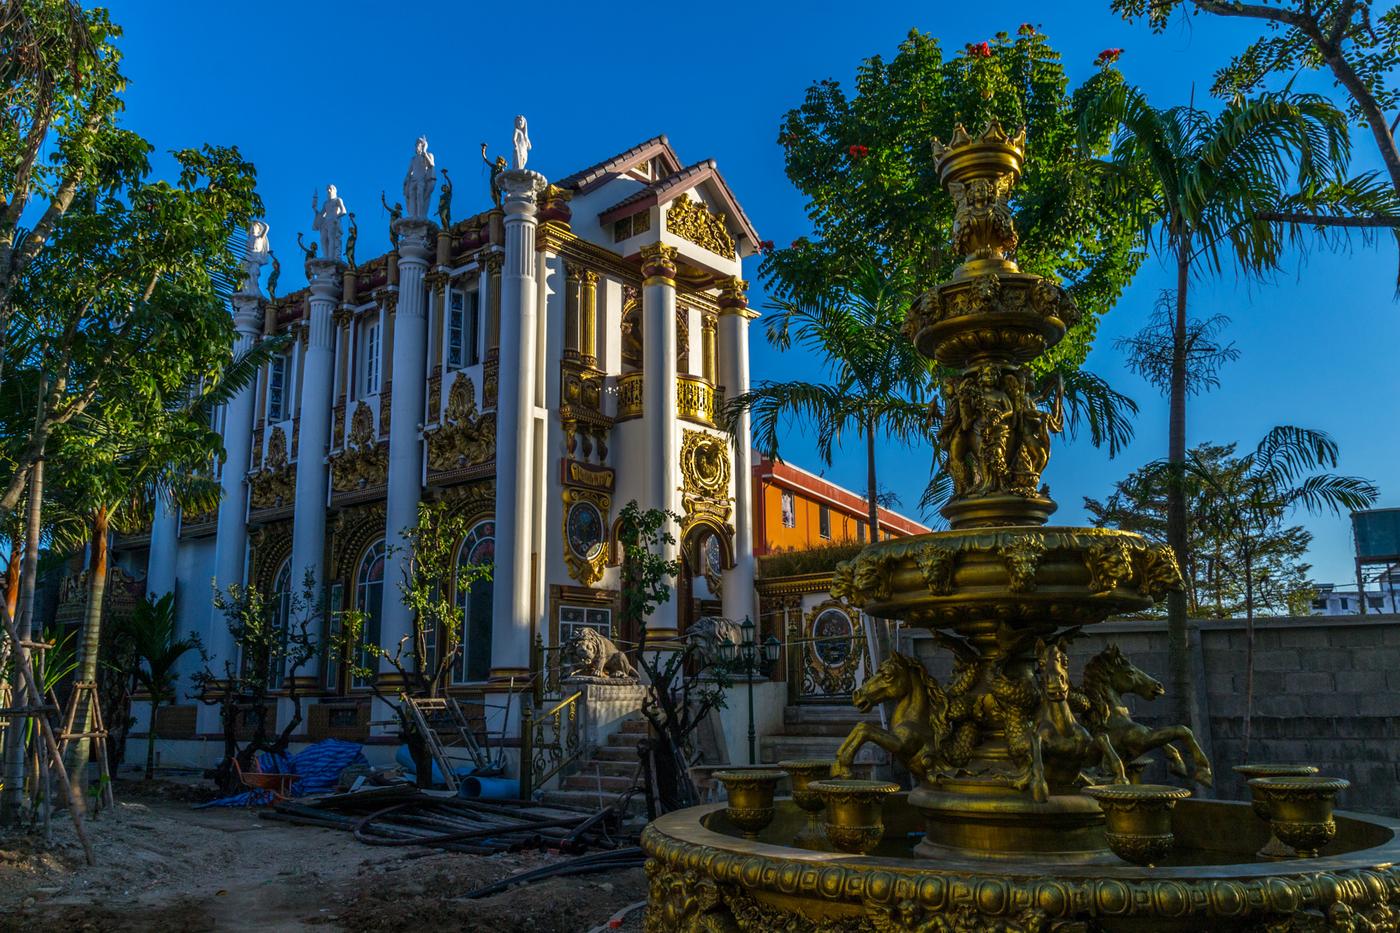 House of Success Chiang Mai-12.jpg